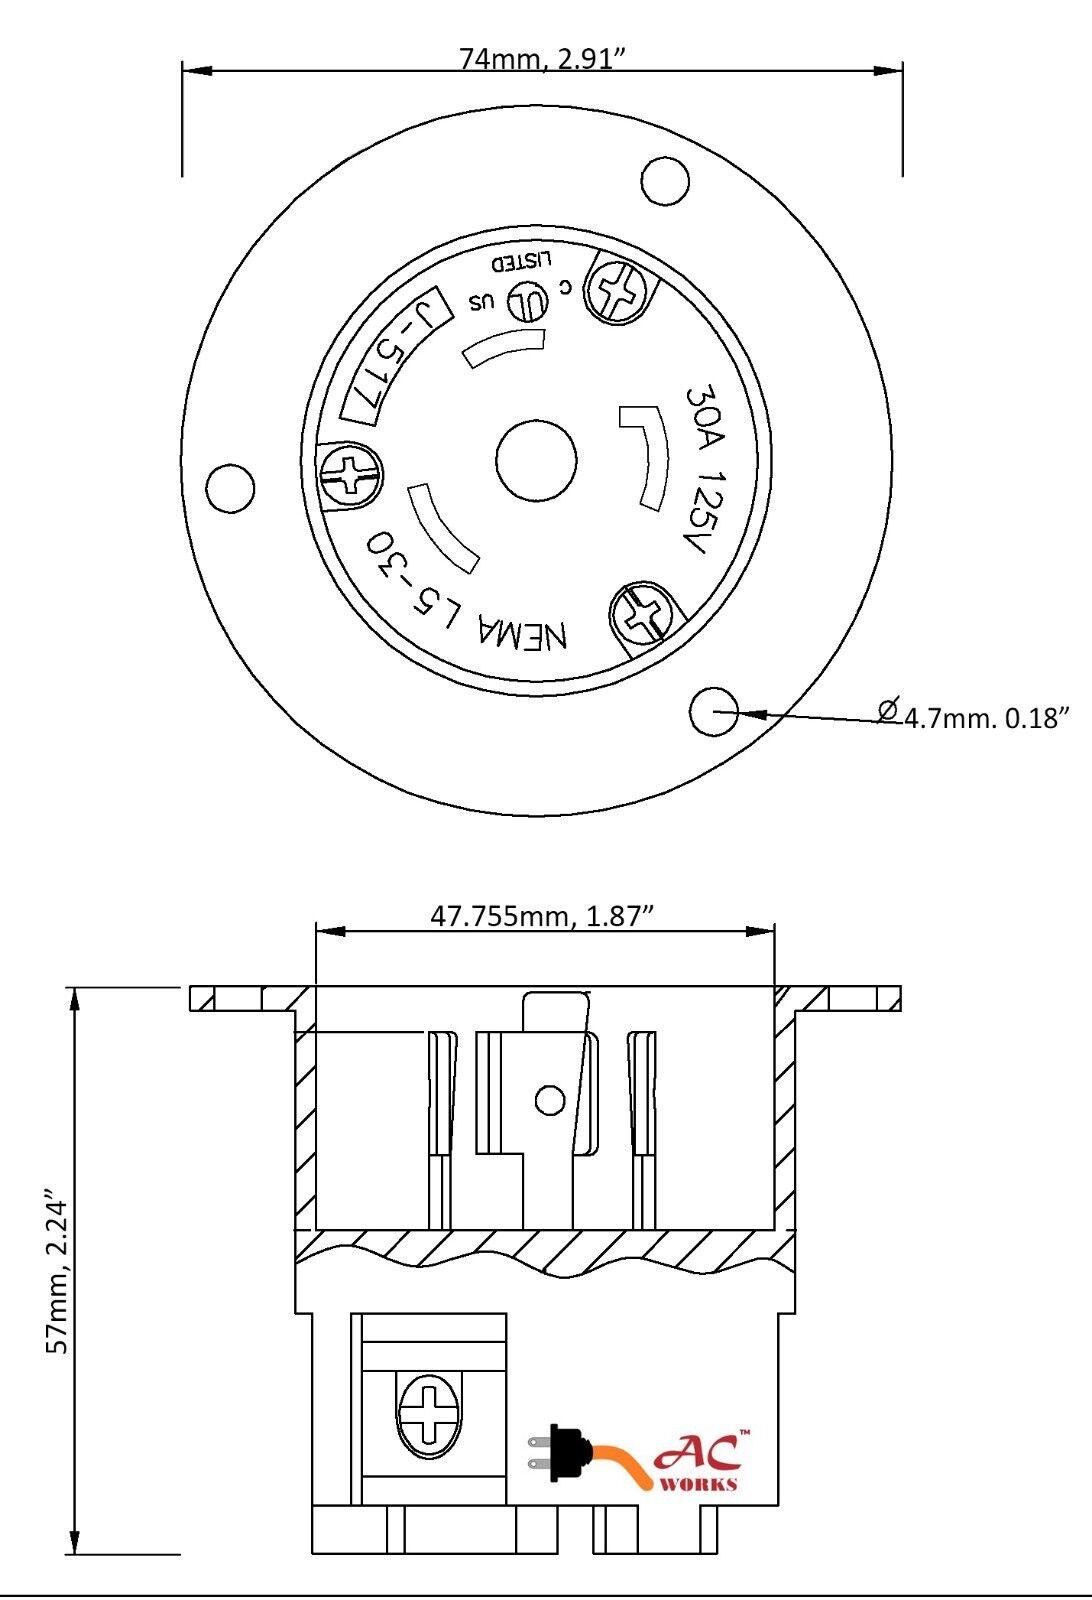 l5 30r wiring diagram database NEMA L6 -30 Wiring nema l5 30r wiring diagram database l5 30r and l6 30r receptacle 30 flanged